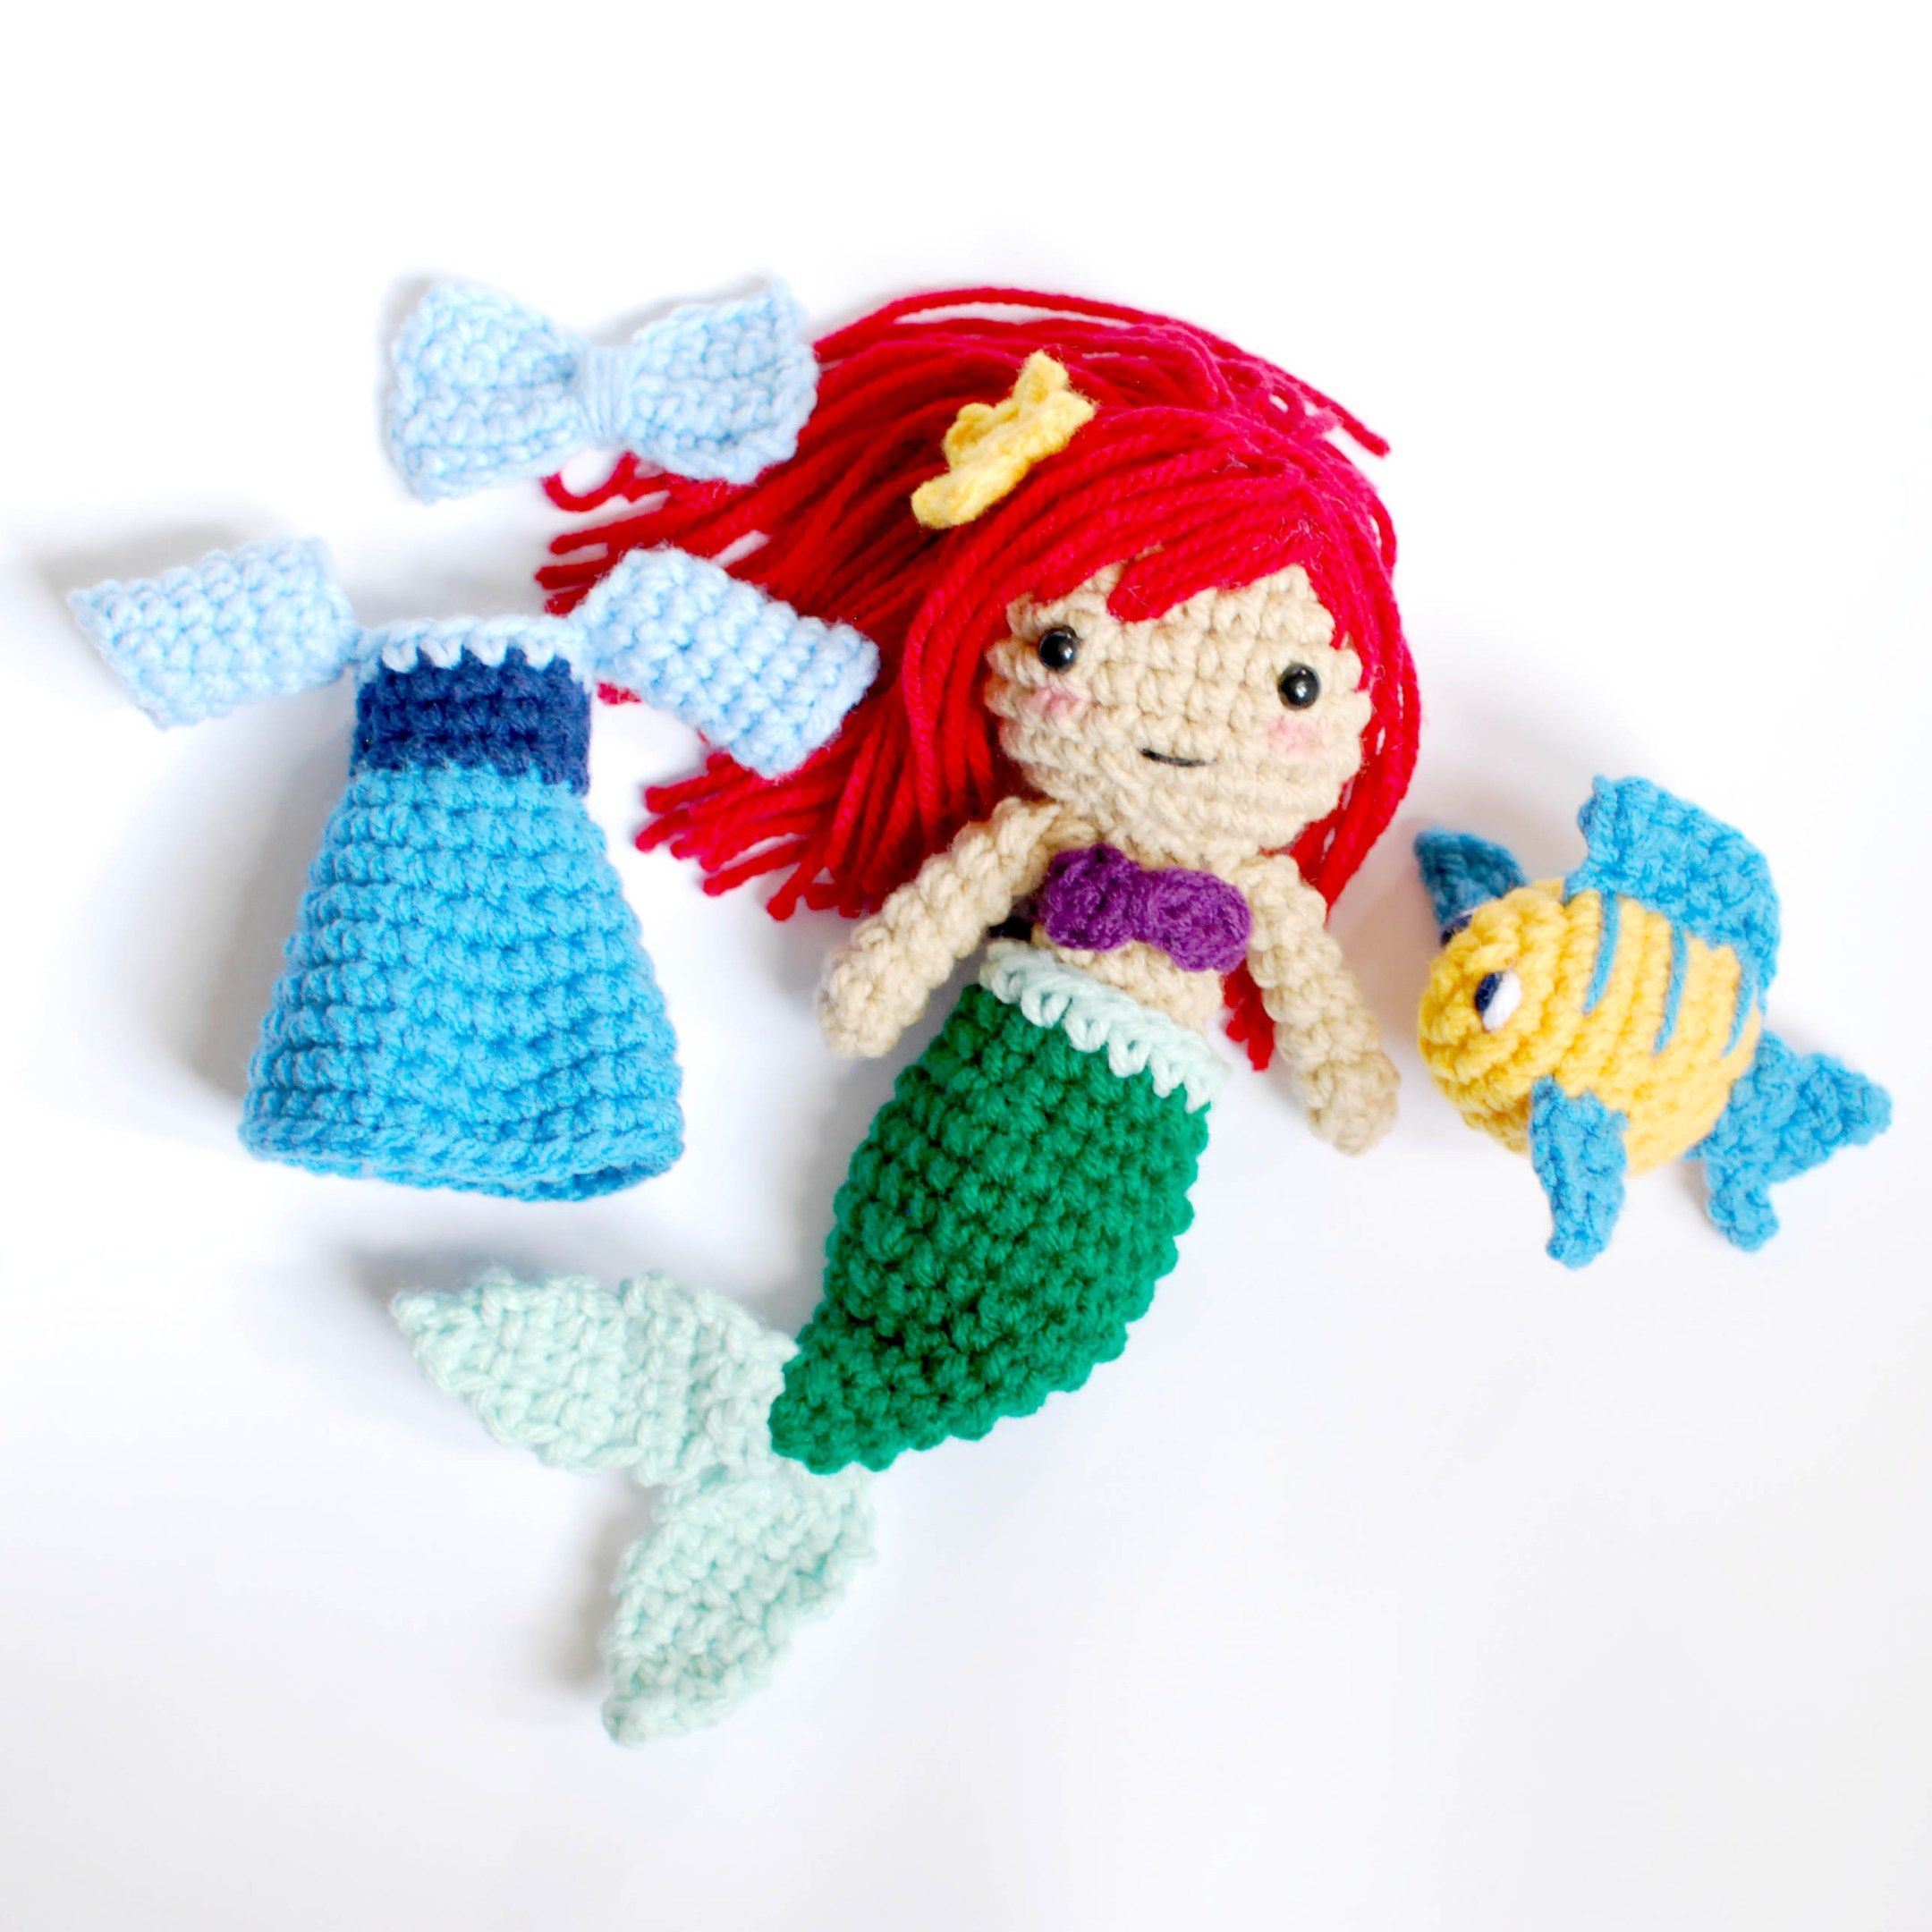 The Little Mermaid - Featured Crochet Pattern | Patrones amigurumi ...